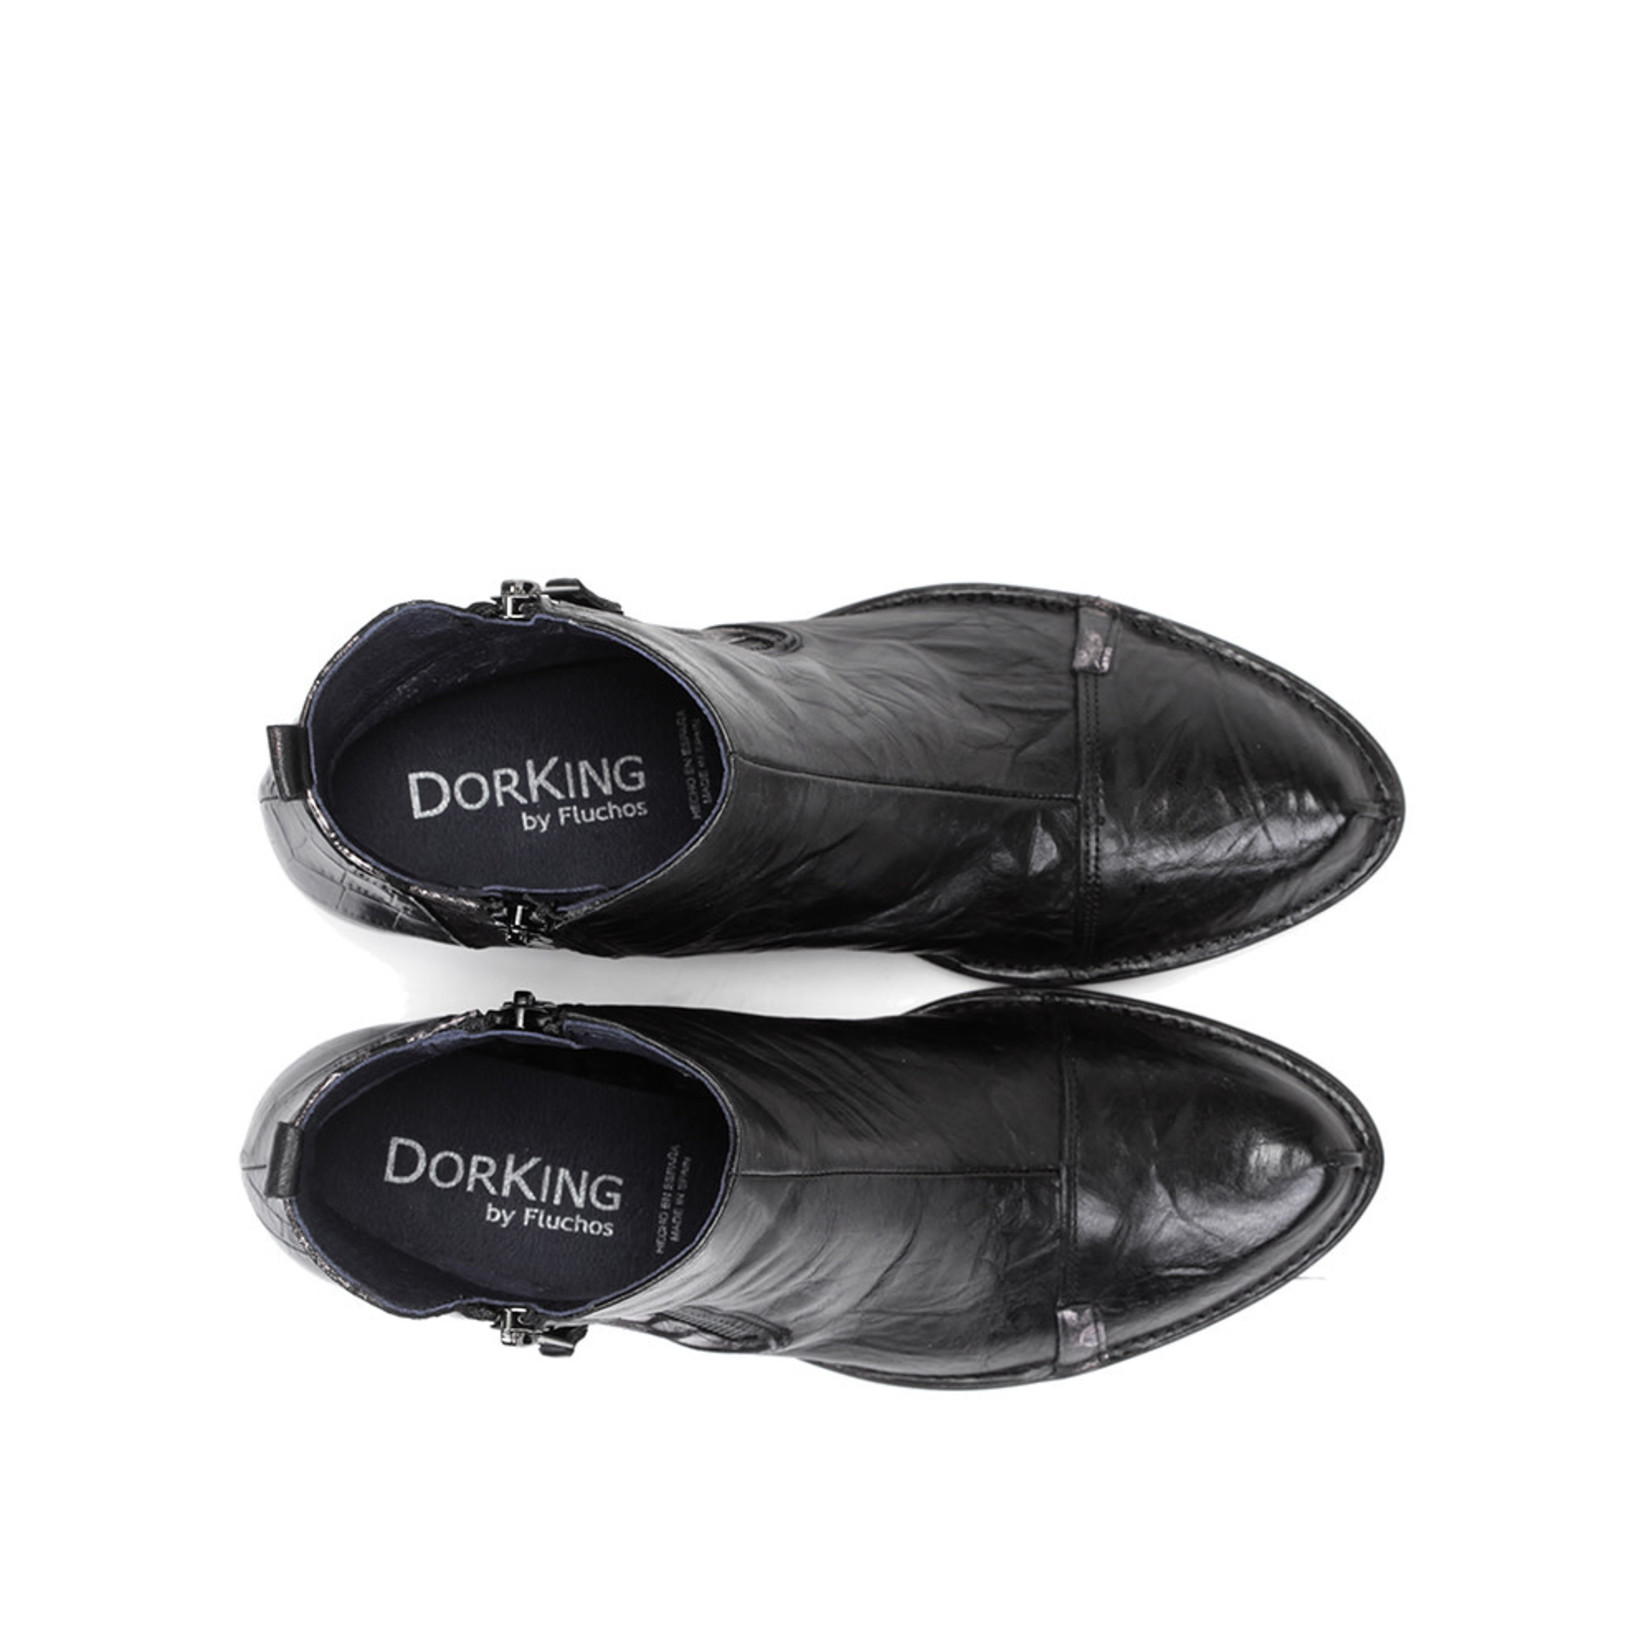 Dorking Dorking Dalma D8352